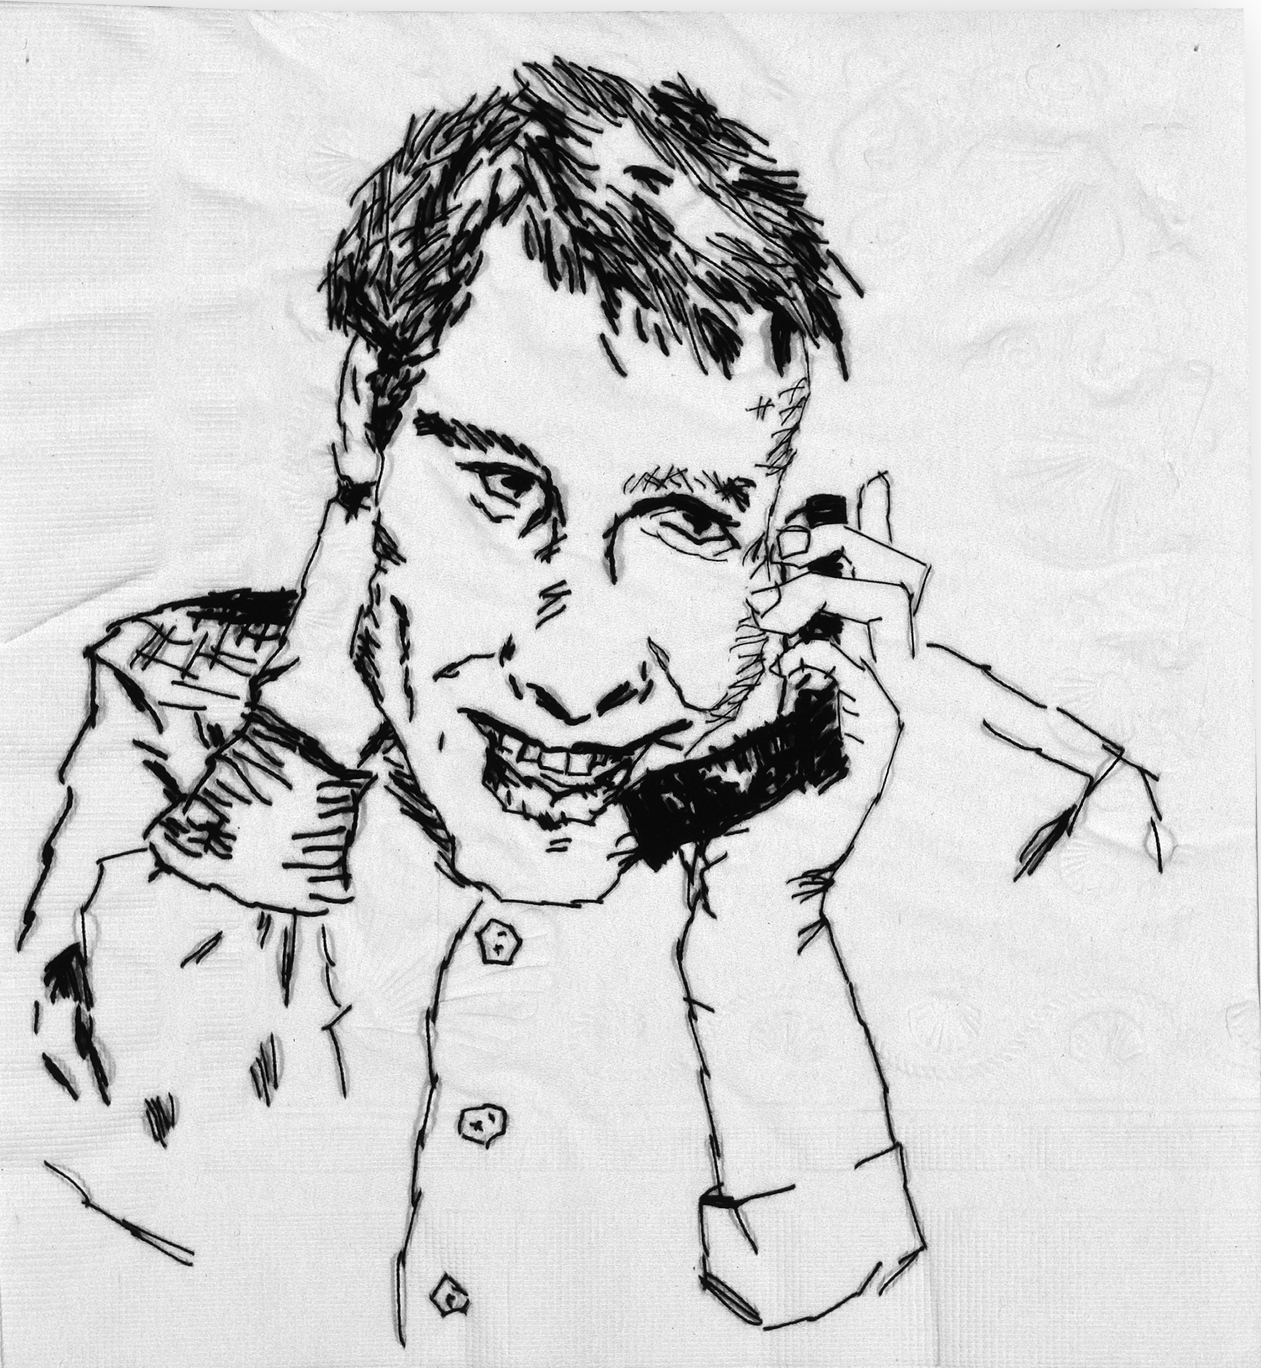 "Ryan II  Black thread on paper napkin, 7"" x 4"", 2005"